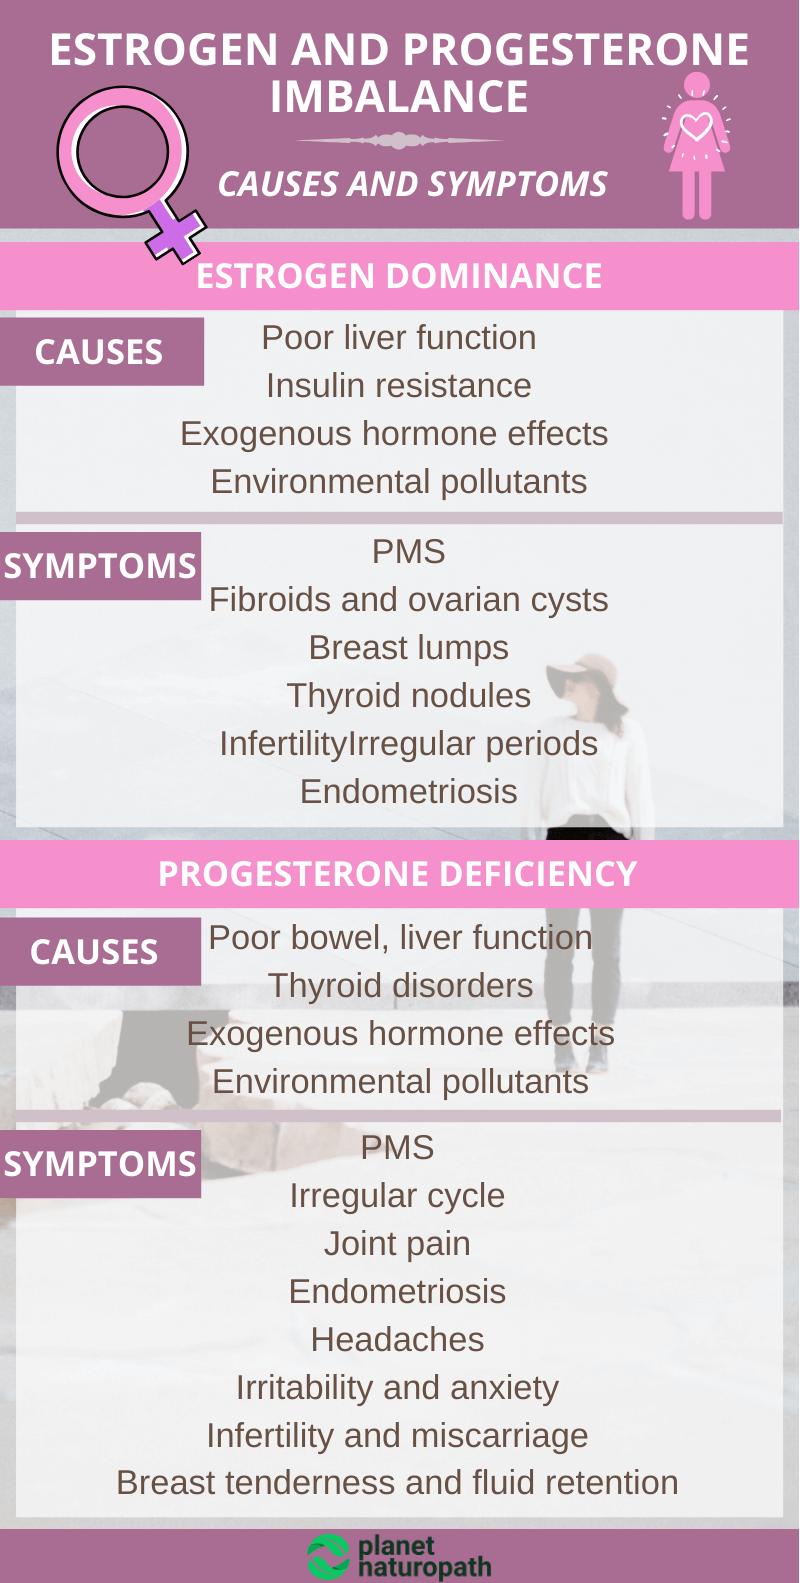 Estrogen-and-progesterone-imbalance